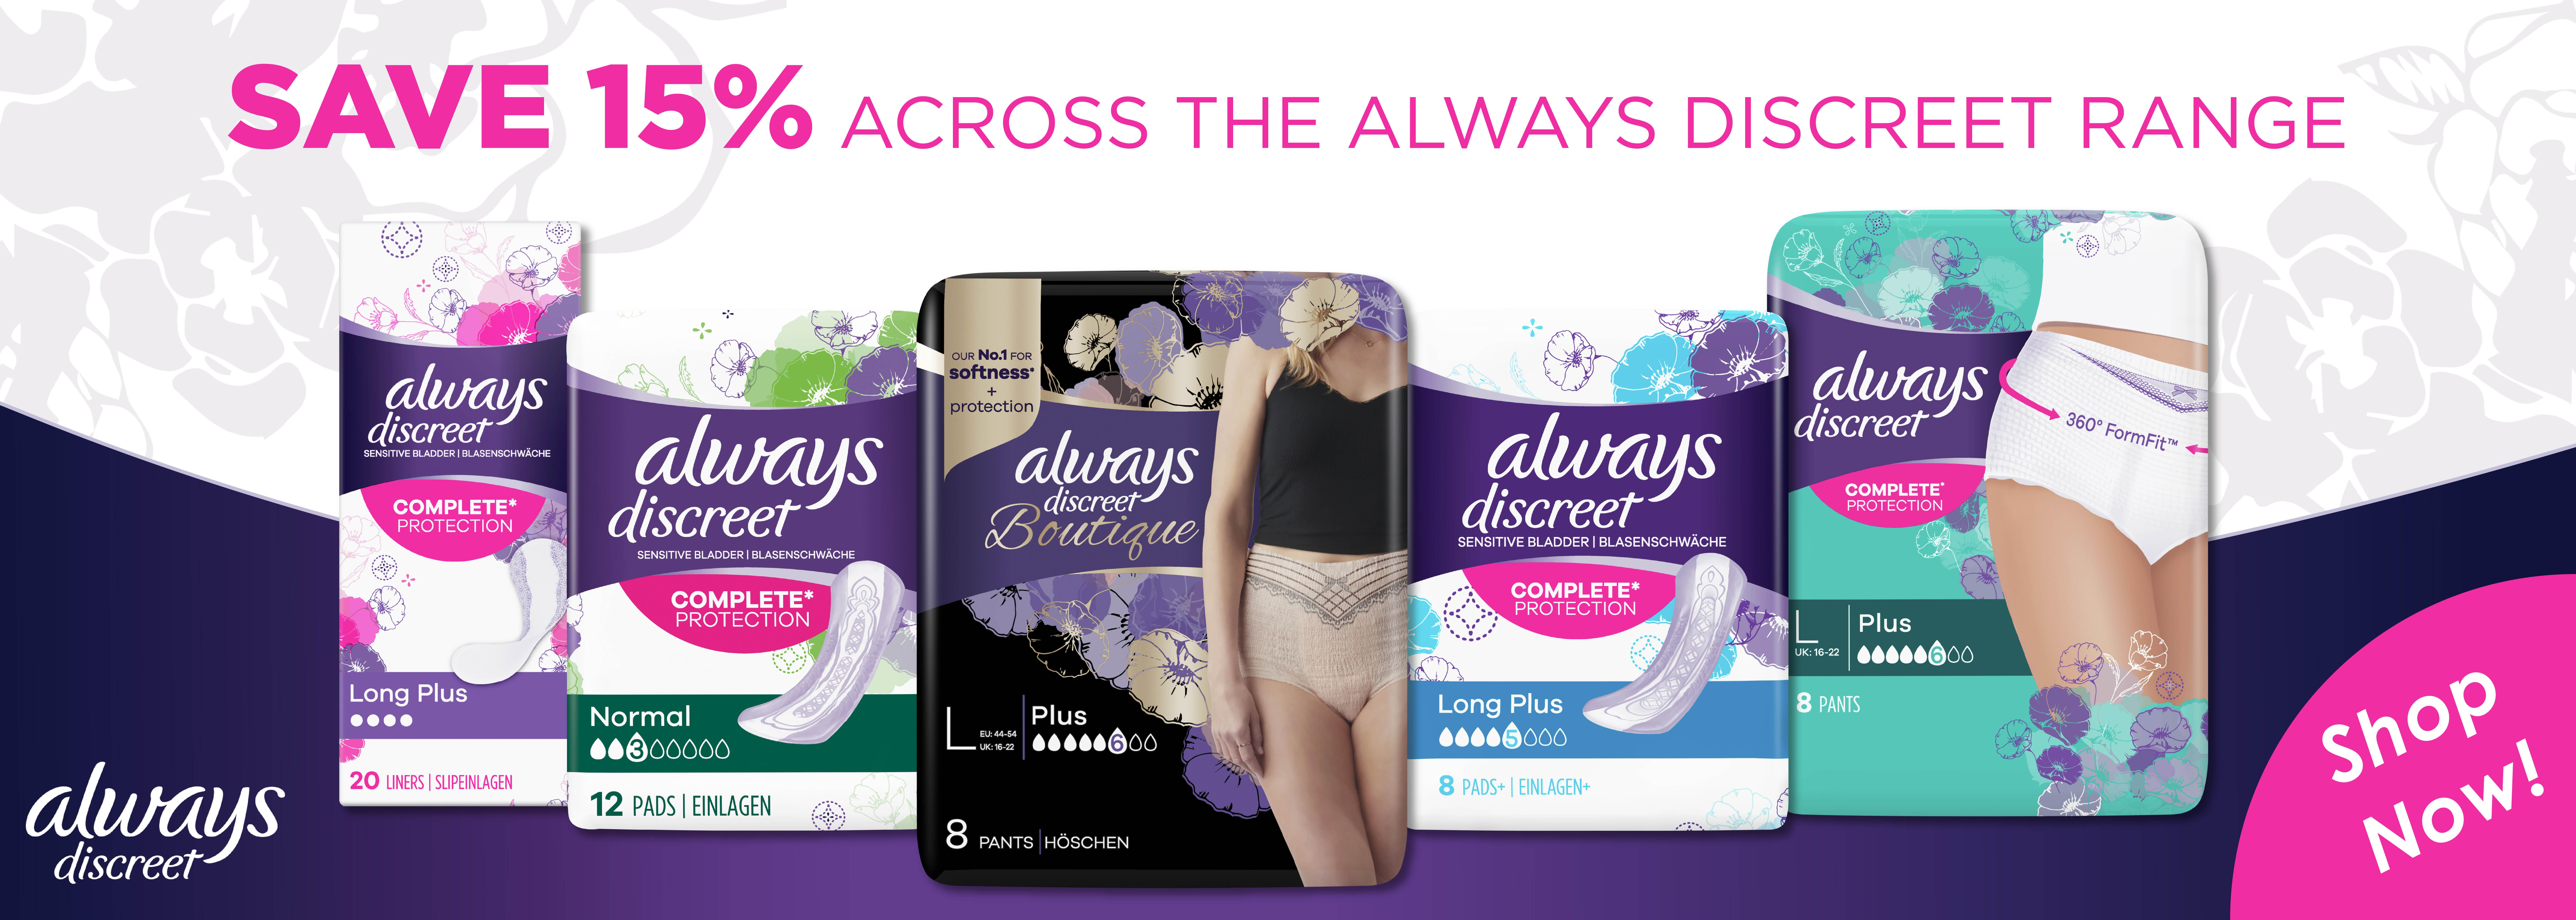 Save 15% on Always Discreet!